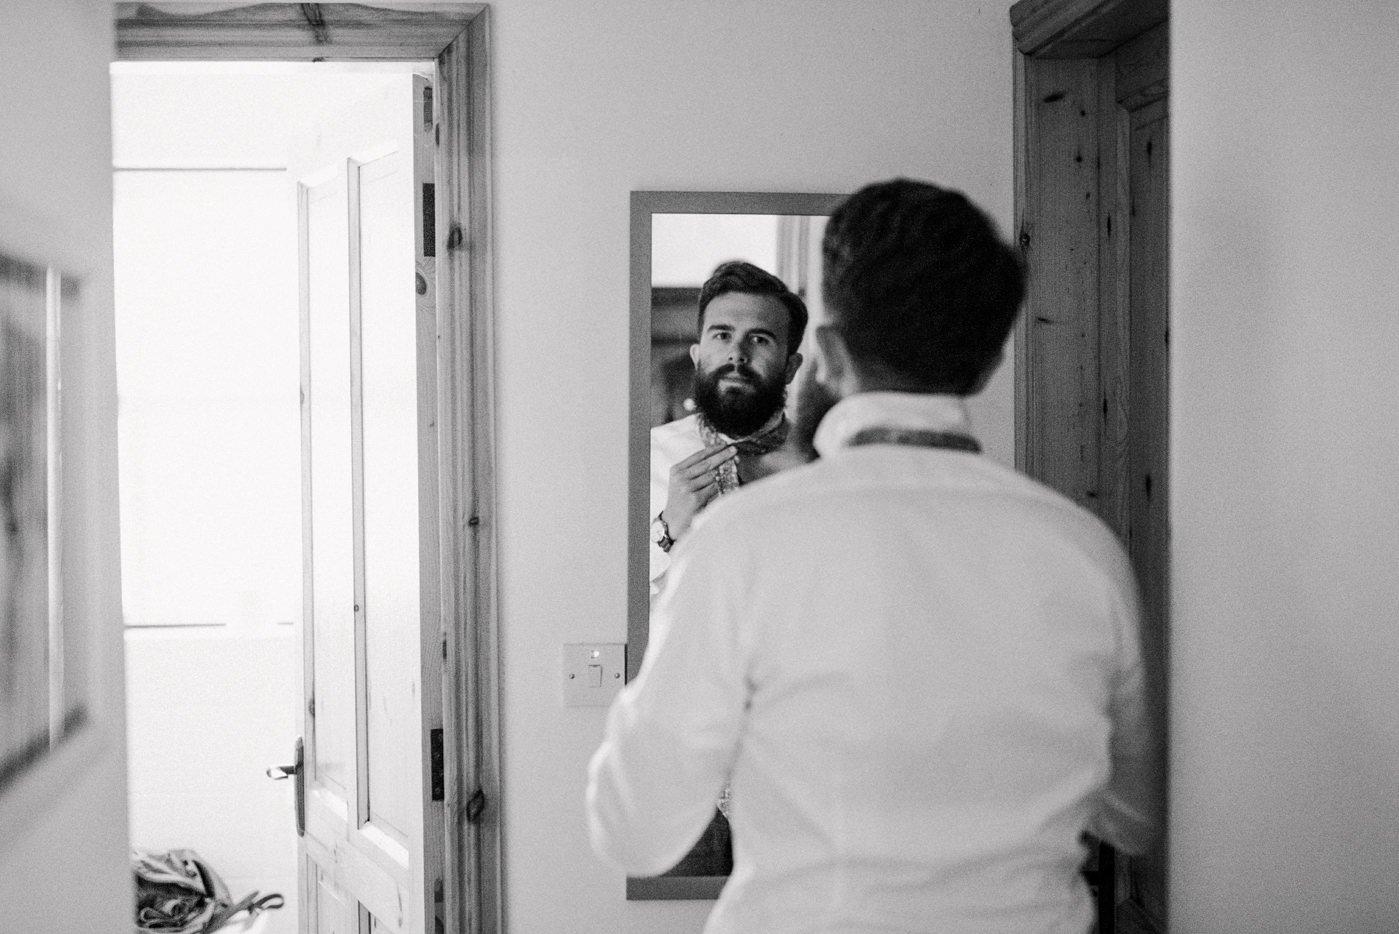 Groom preparing pre-wedding Documentary wedding photography Westcove House Ireland